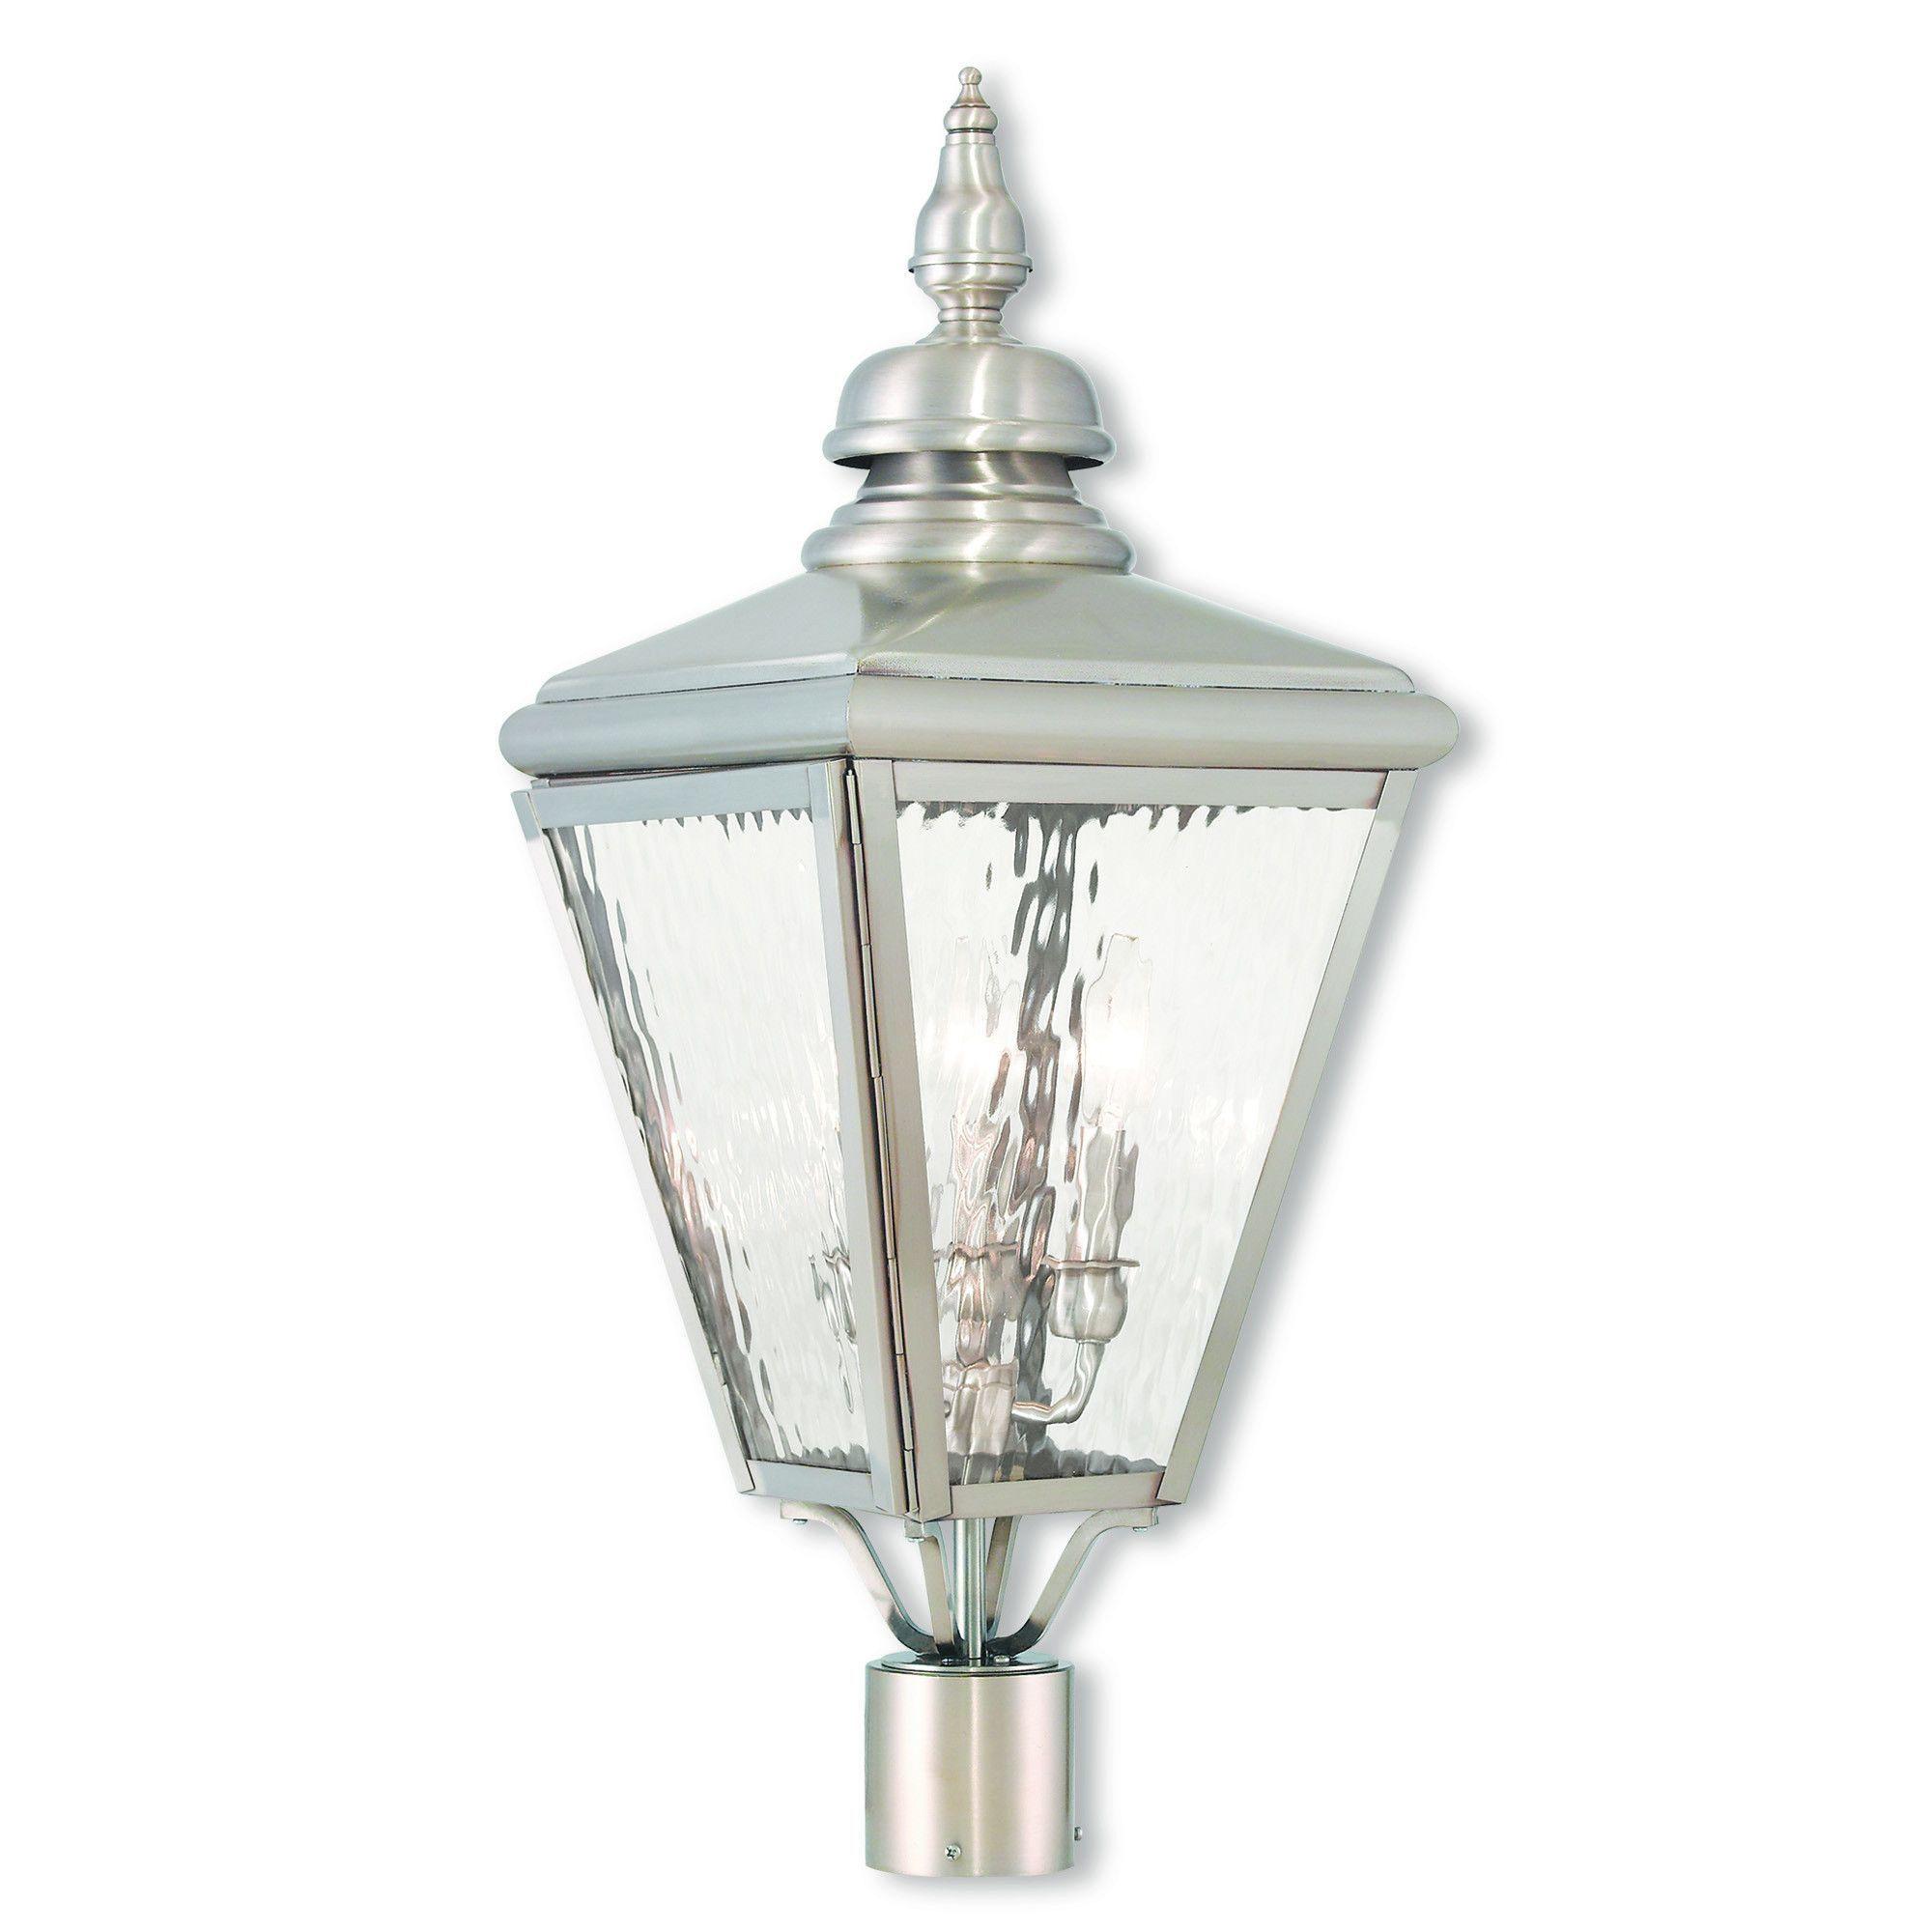 Livex Lighting Cambridge Brushed Nickel Post-Top Lanterm 20433-91